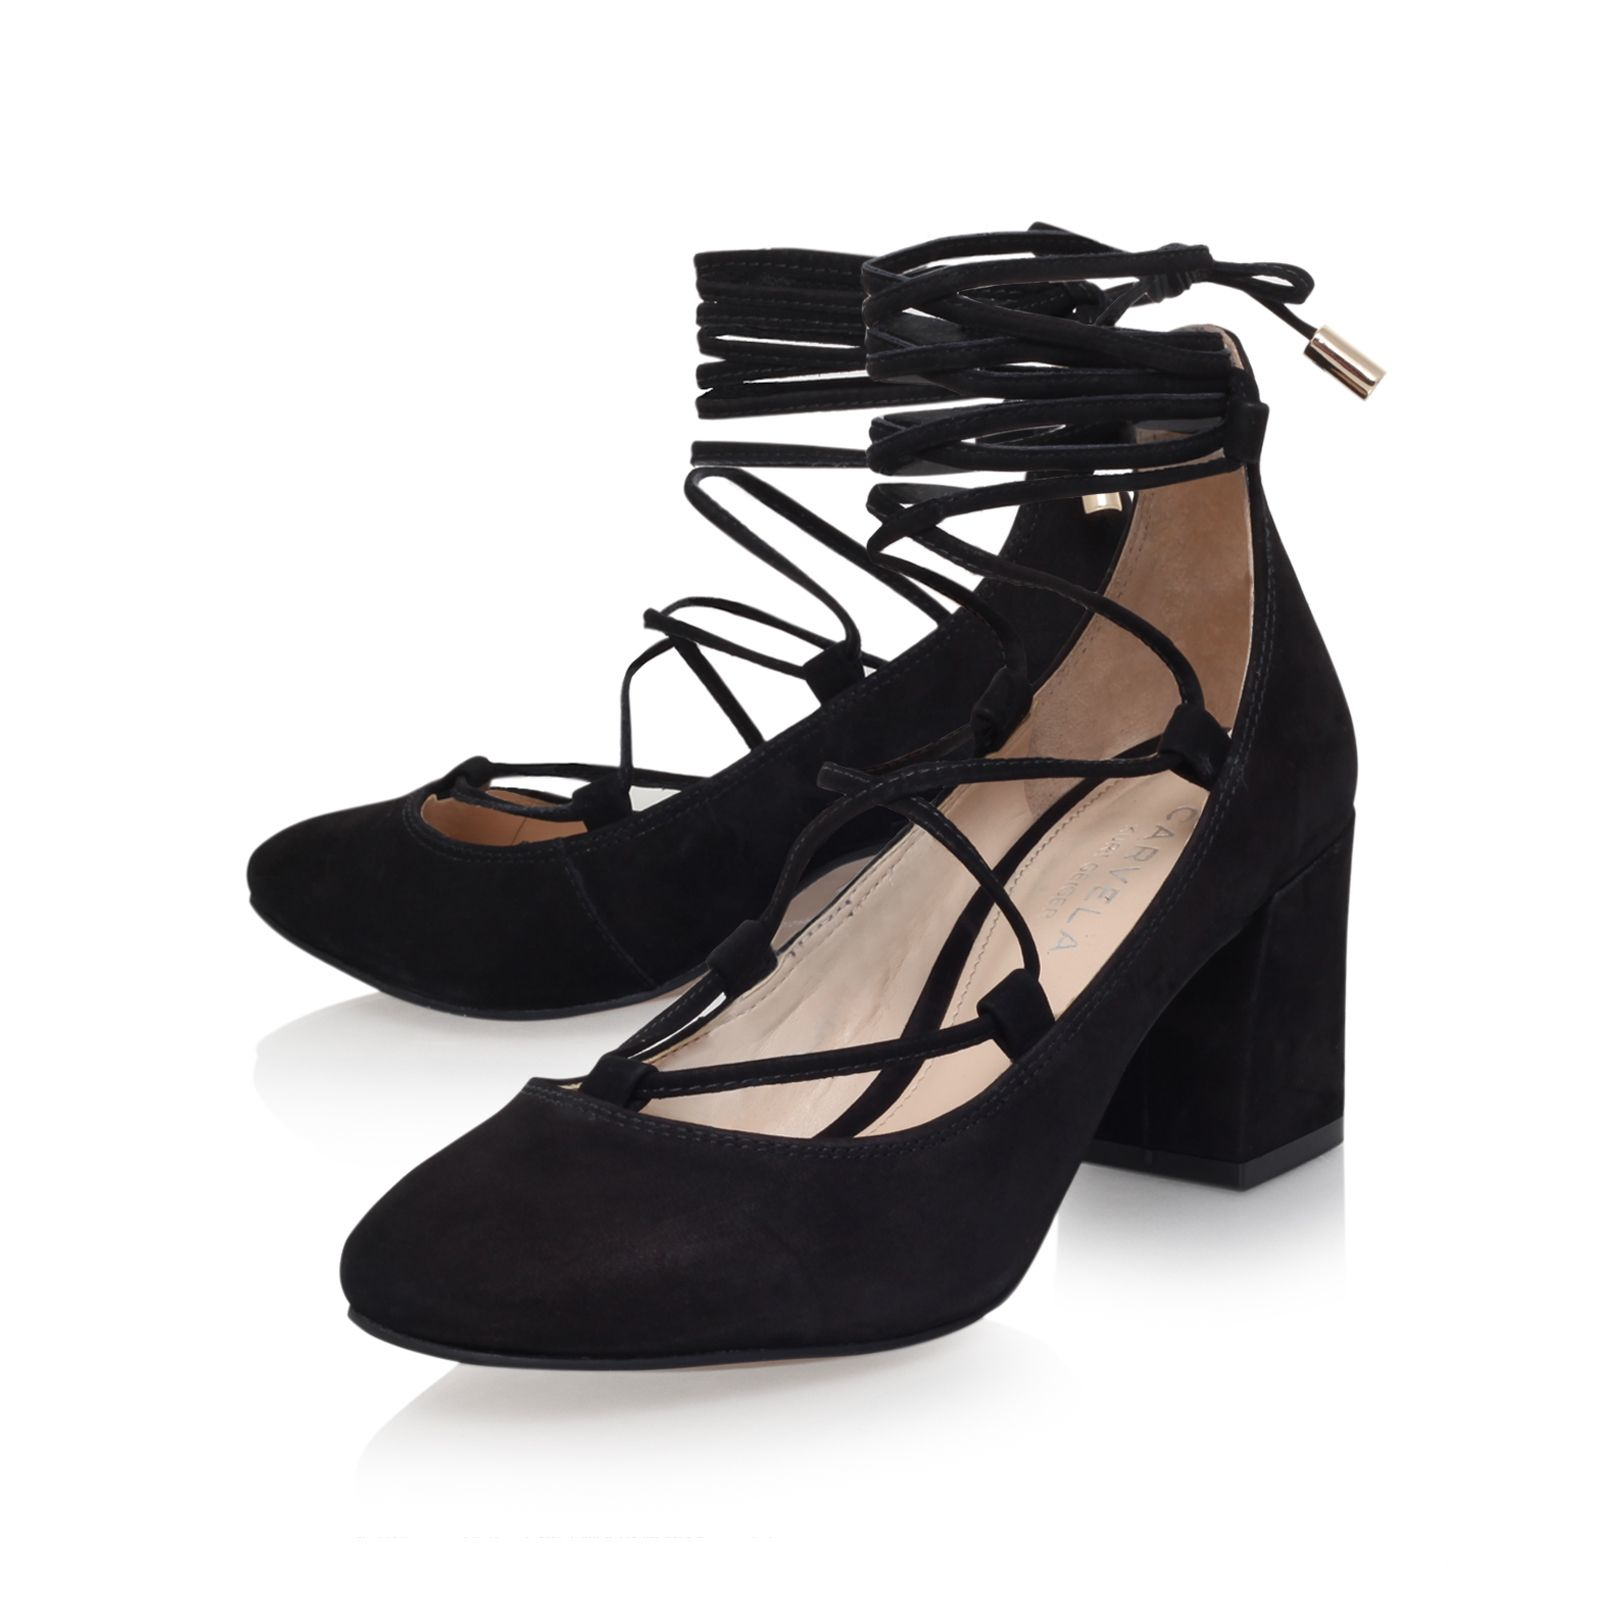 carvela kurt geiger aid high heel court shoes in black lyst